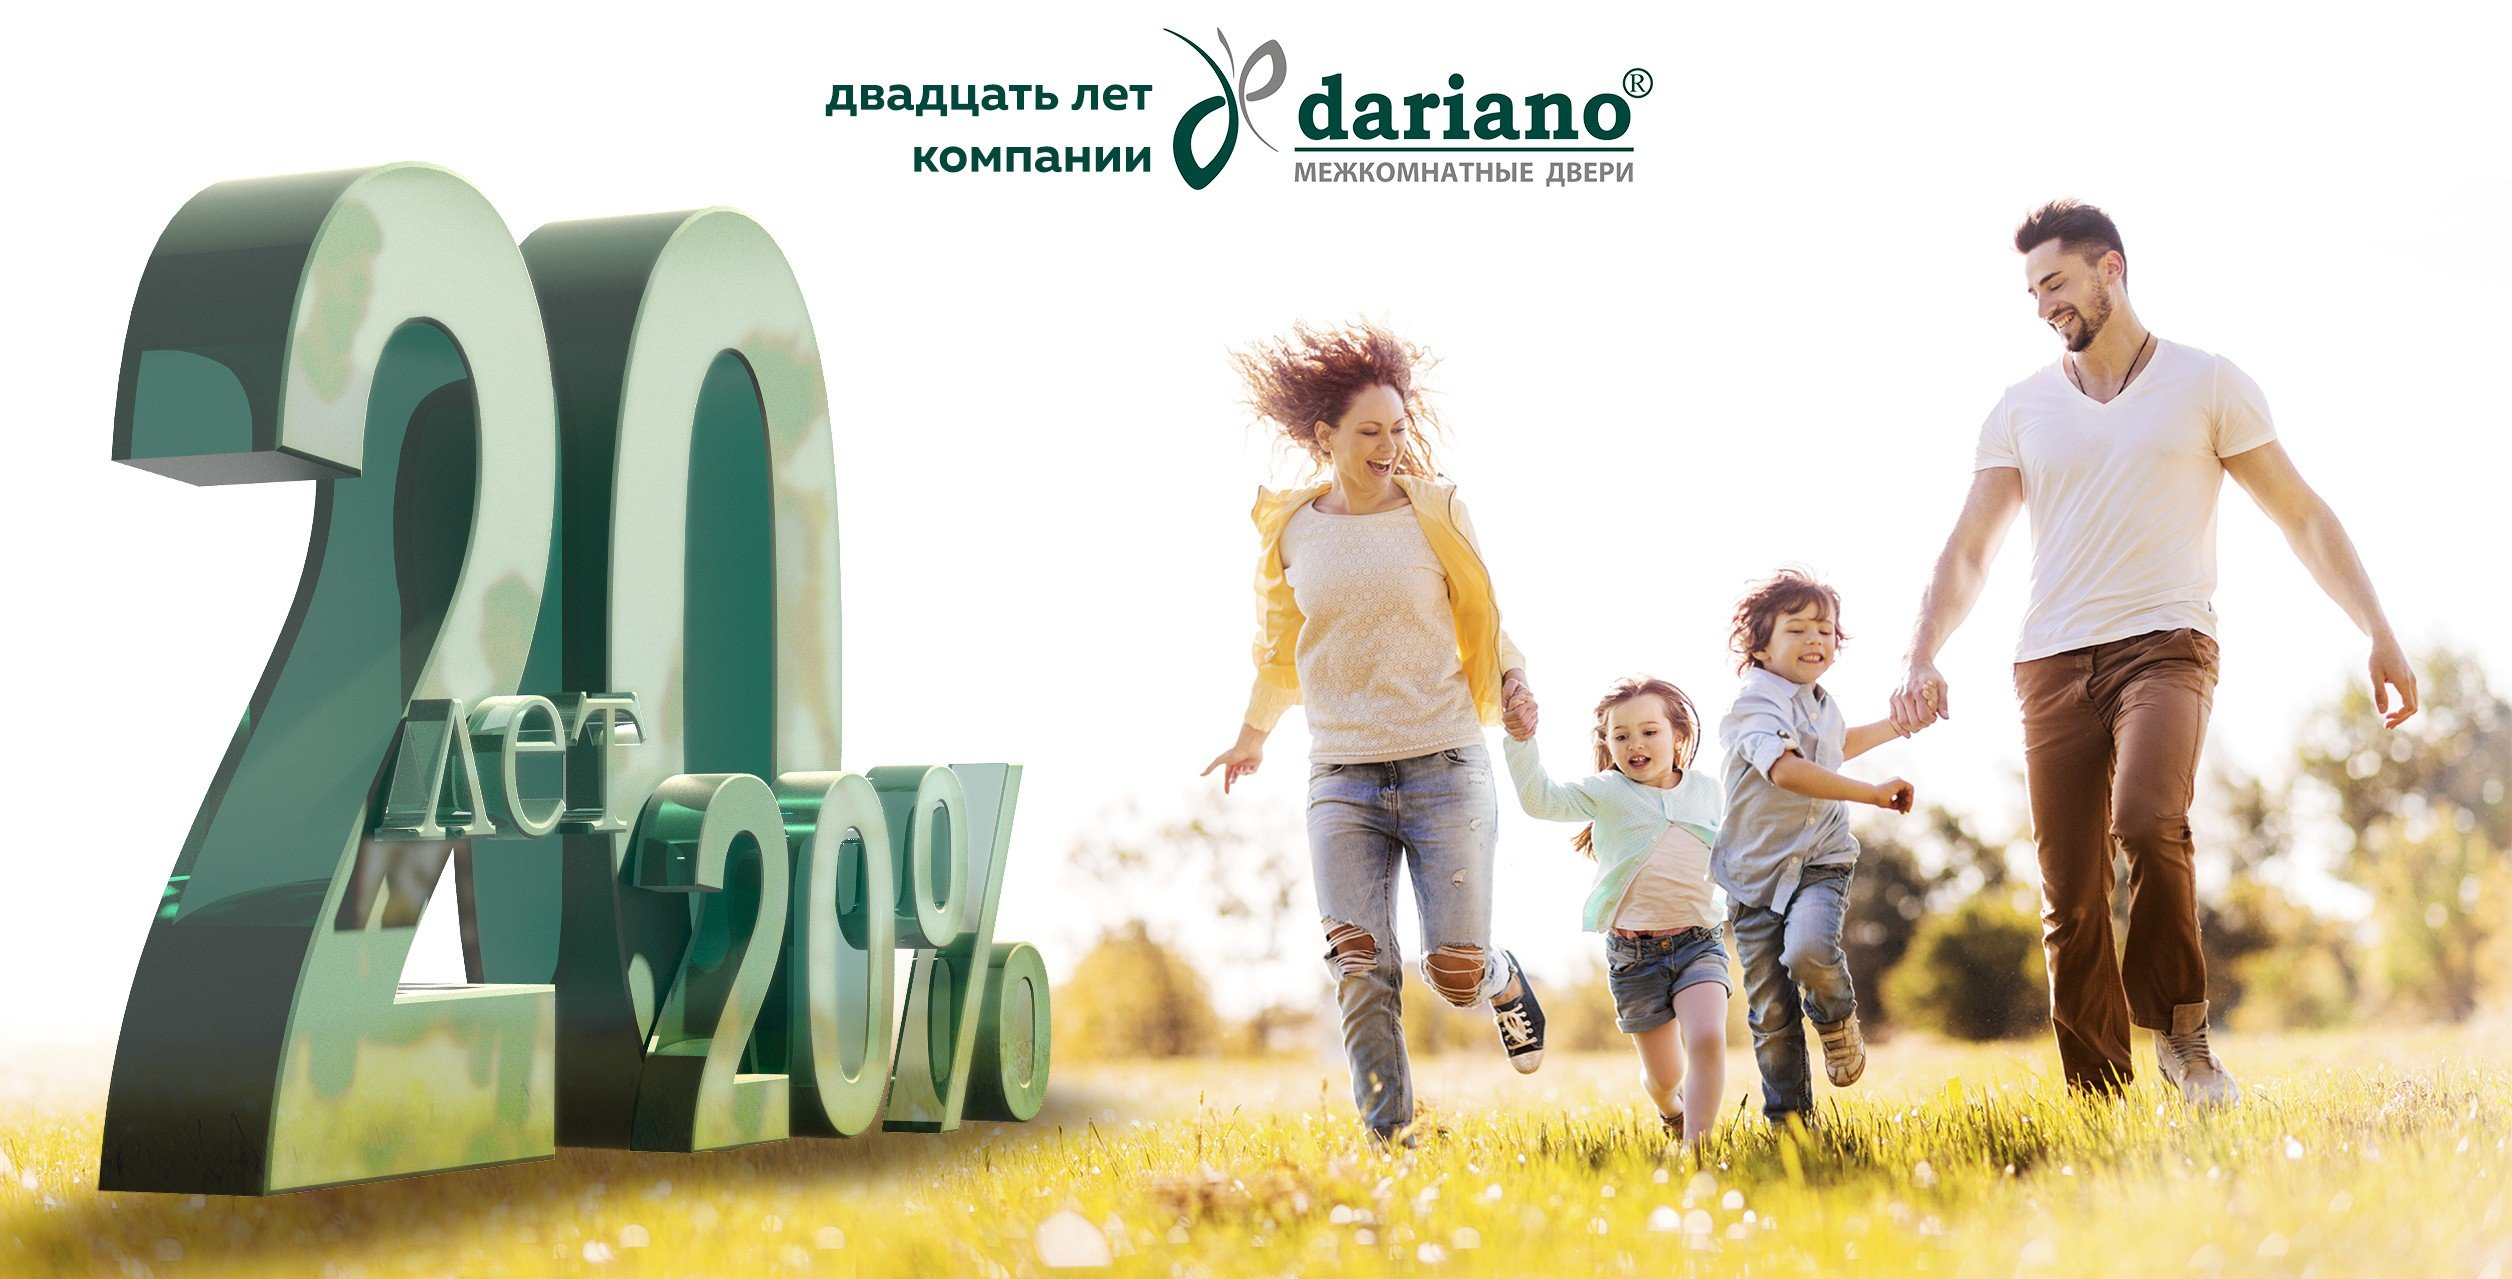 dariano: Нам 20 лет!